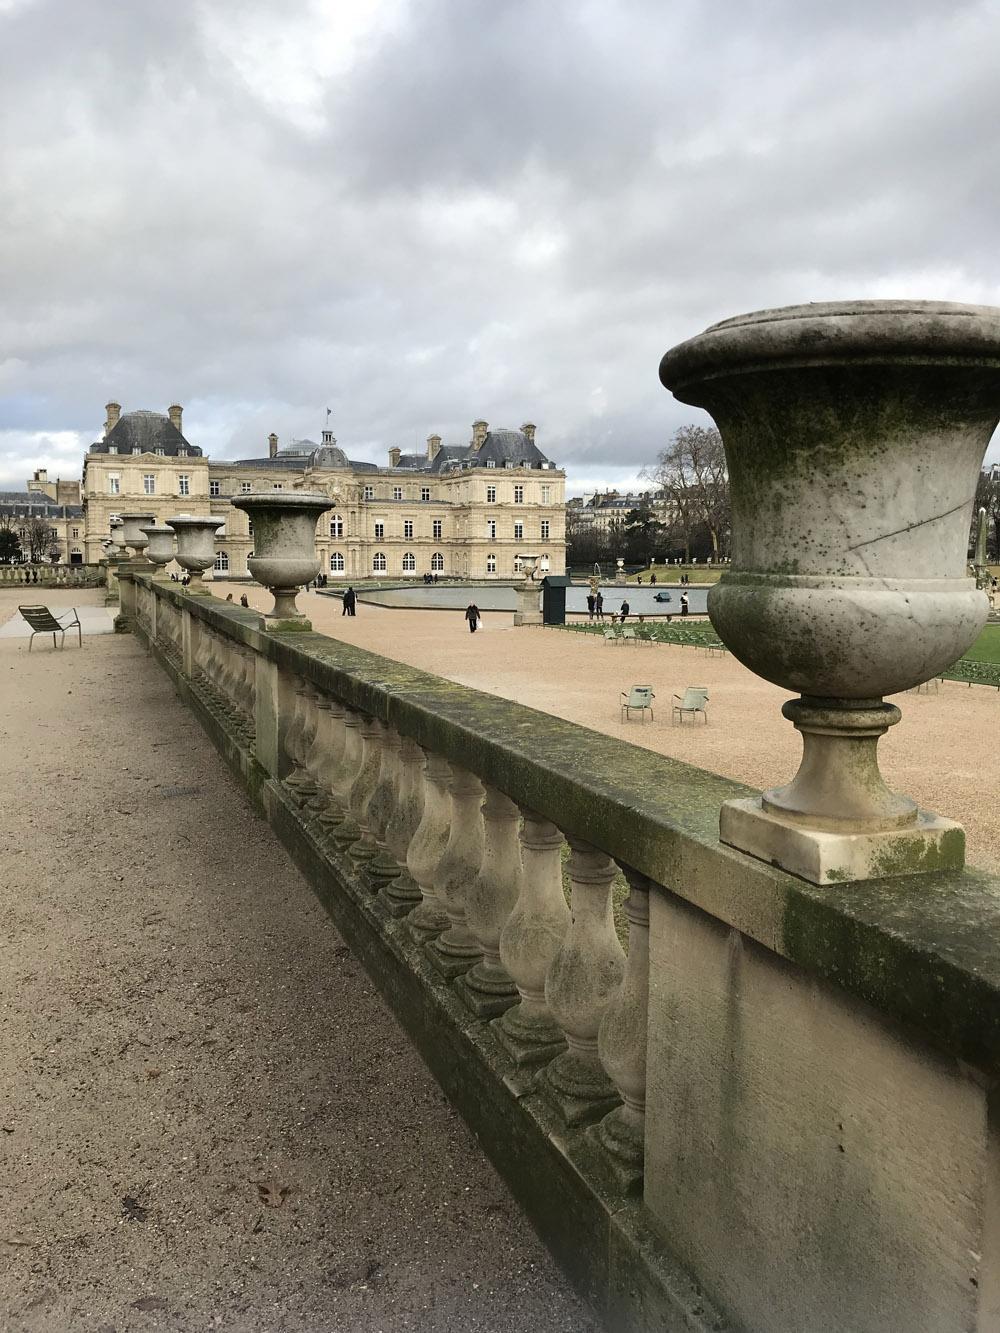 jardin-du-luxembourg-senat-paris-alicia-drake